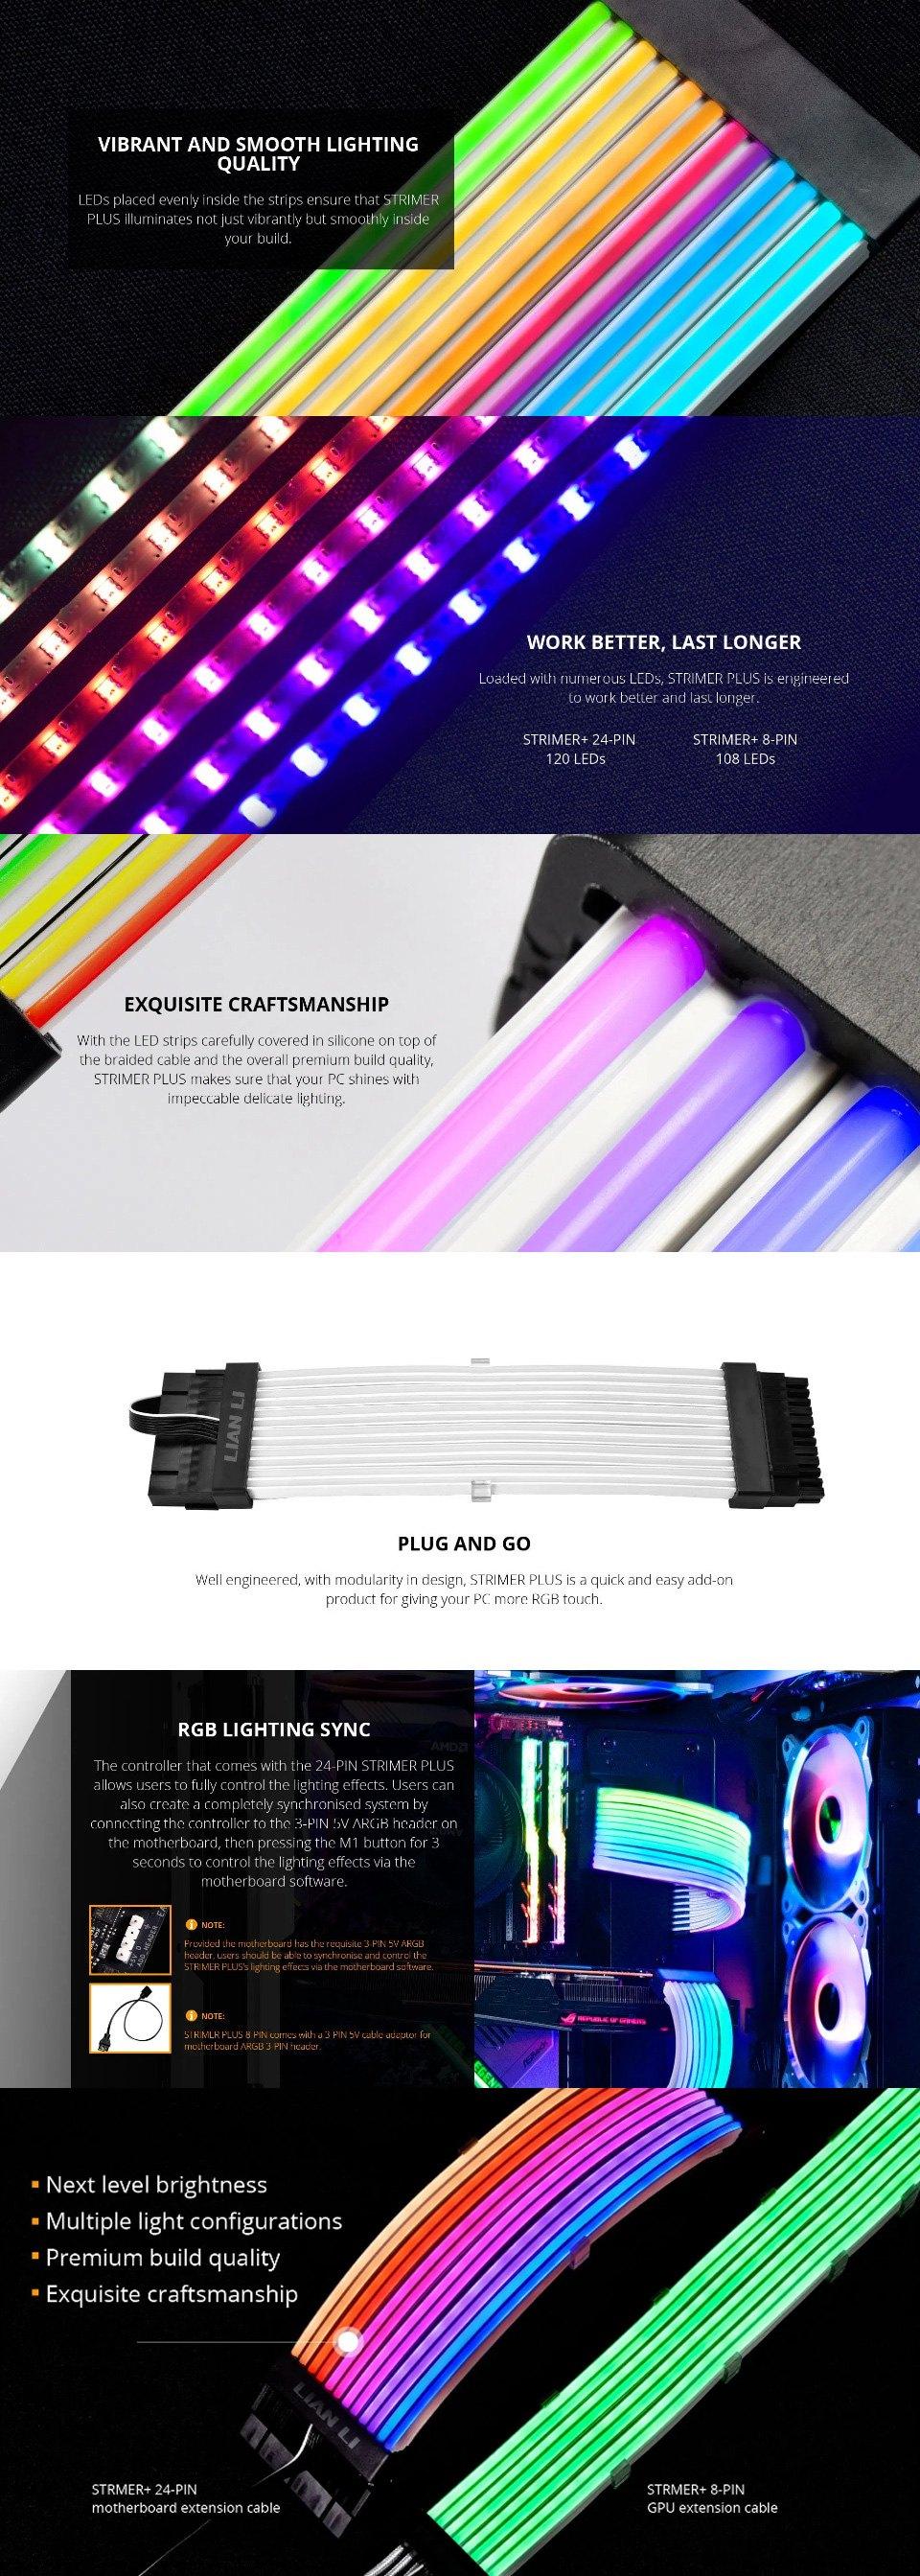 Lian Li Strimer+ ARGB 8 Pin Extension Cable features 2